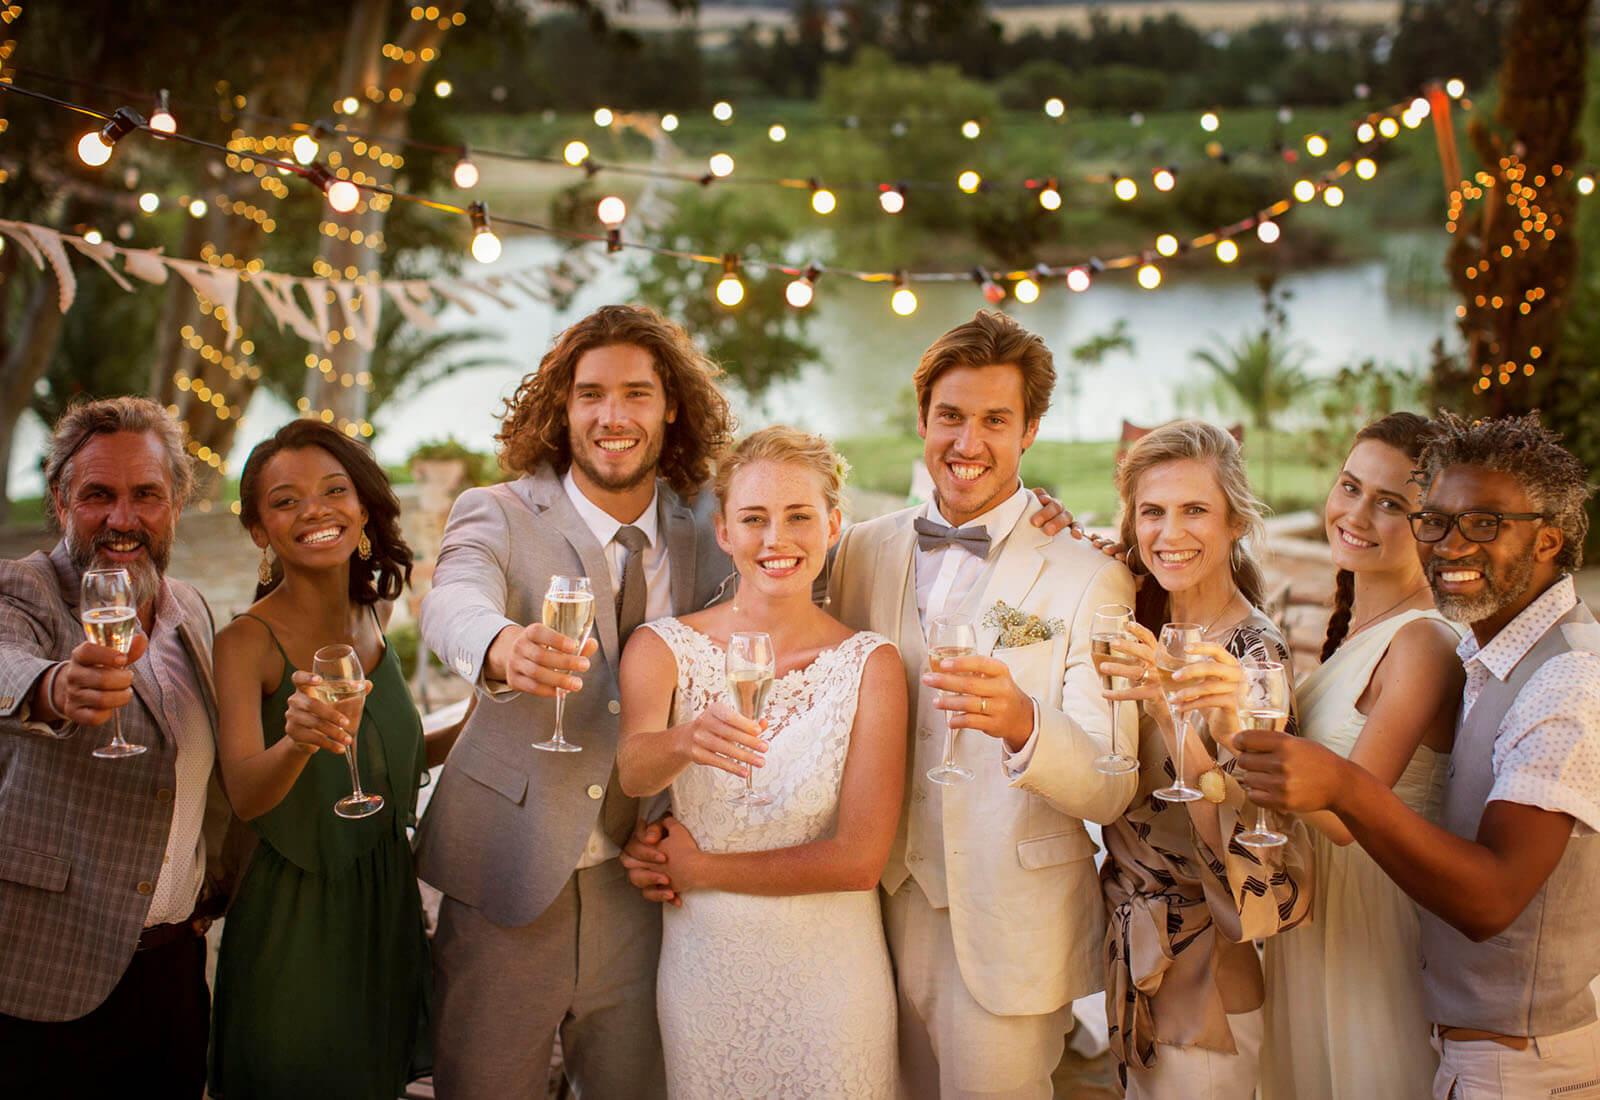 que-vestir-boda-si-eres-invitado.jpg